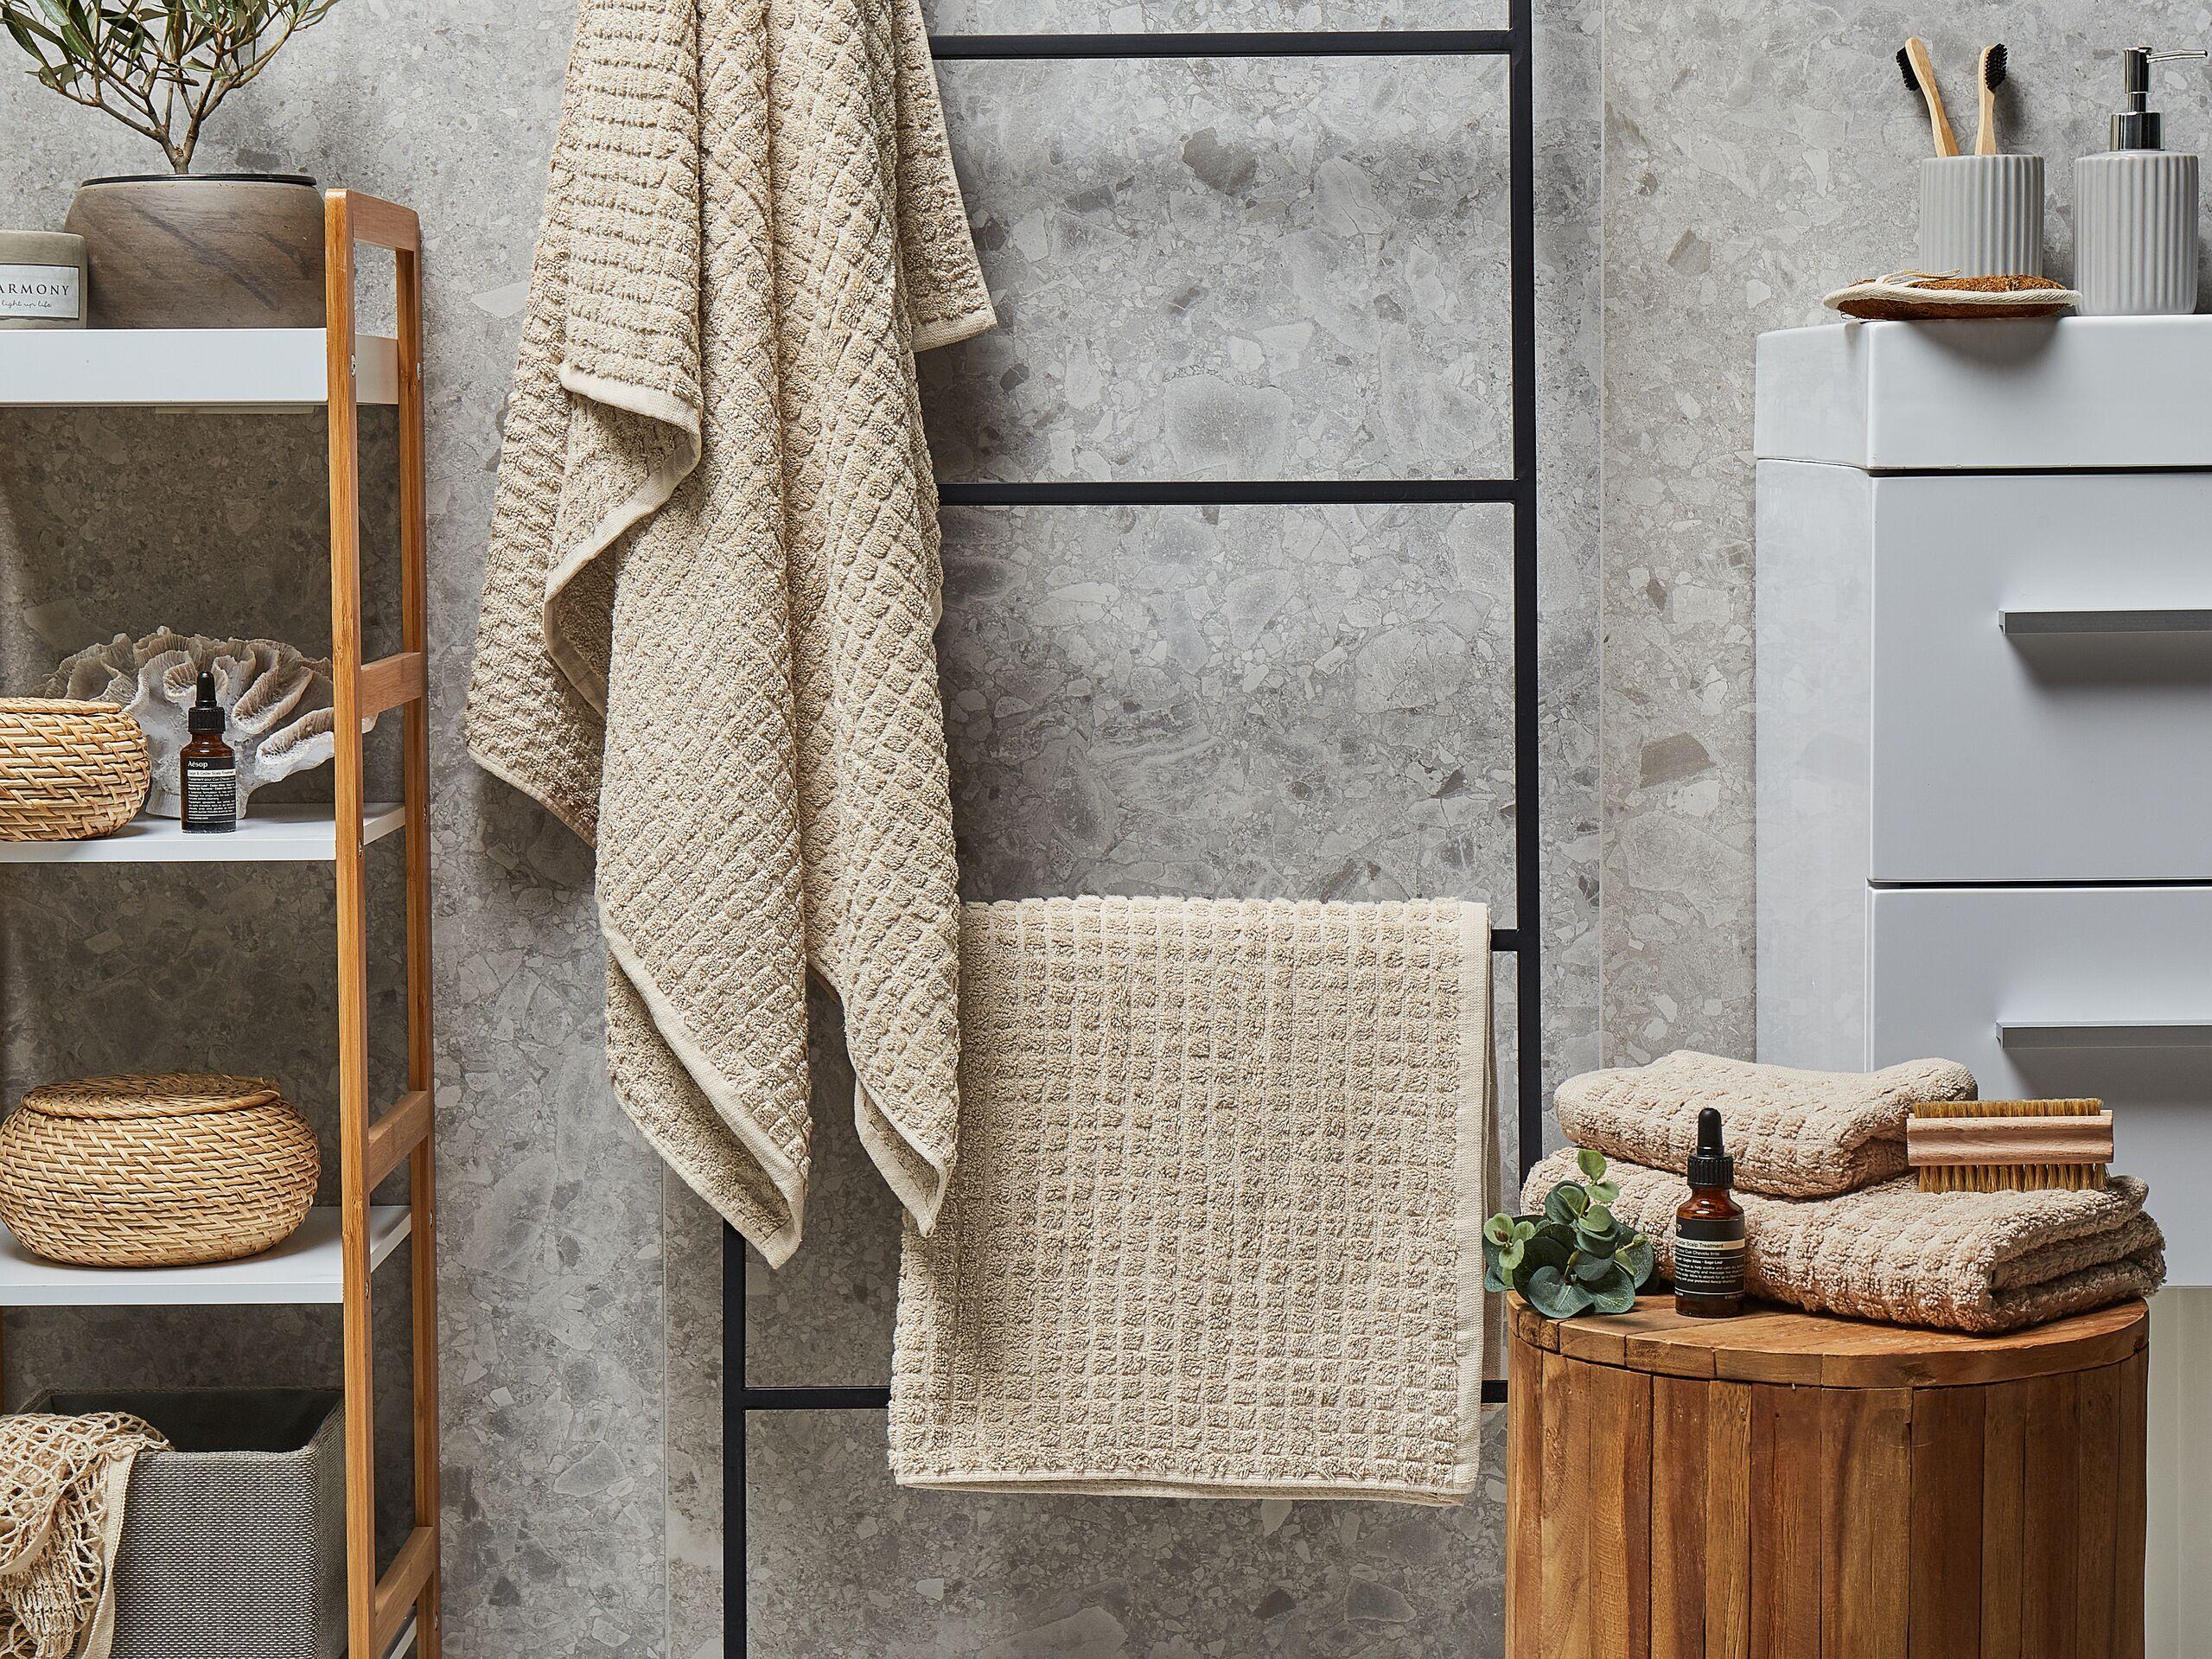 beliani set di 4 asciugamani beige da bagno in morbido cotone low twist accessori bagno